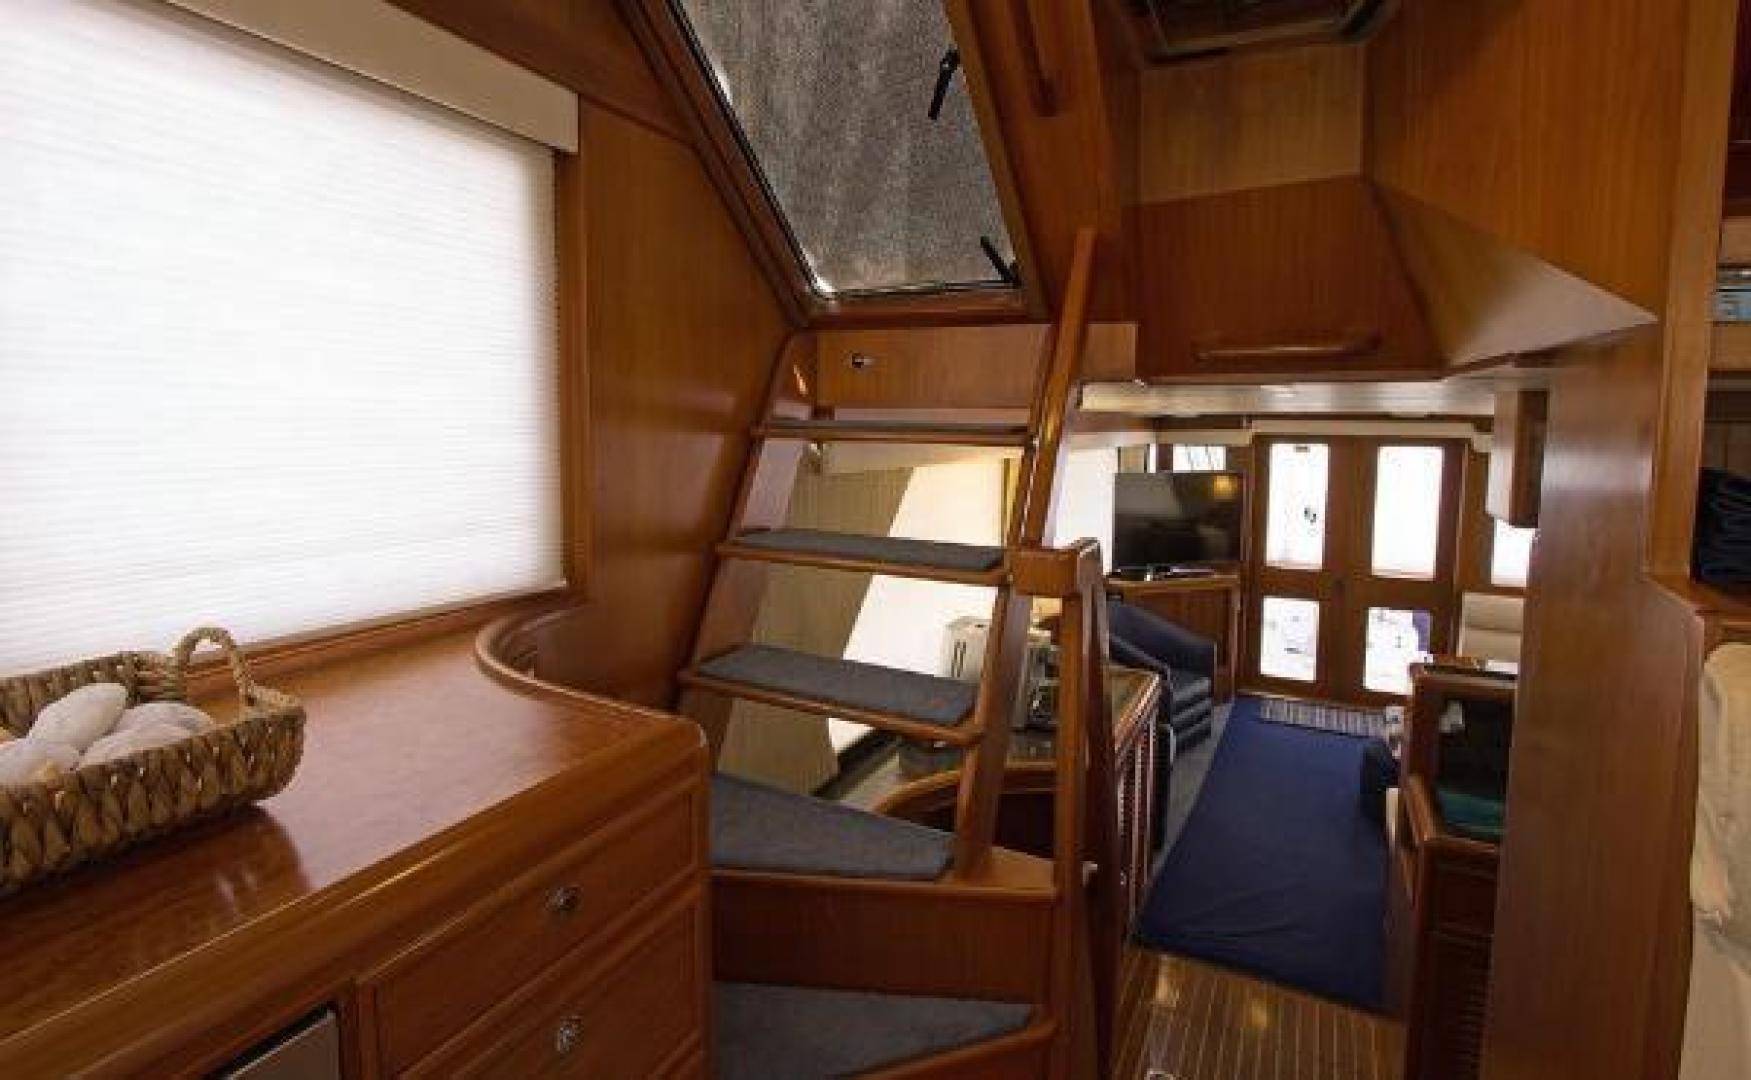 Offshore Yachts-62 Pilot House 2001-Sandman II Fort Lauderdale-Florida-United States-1367903   Thumbnail